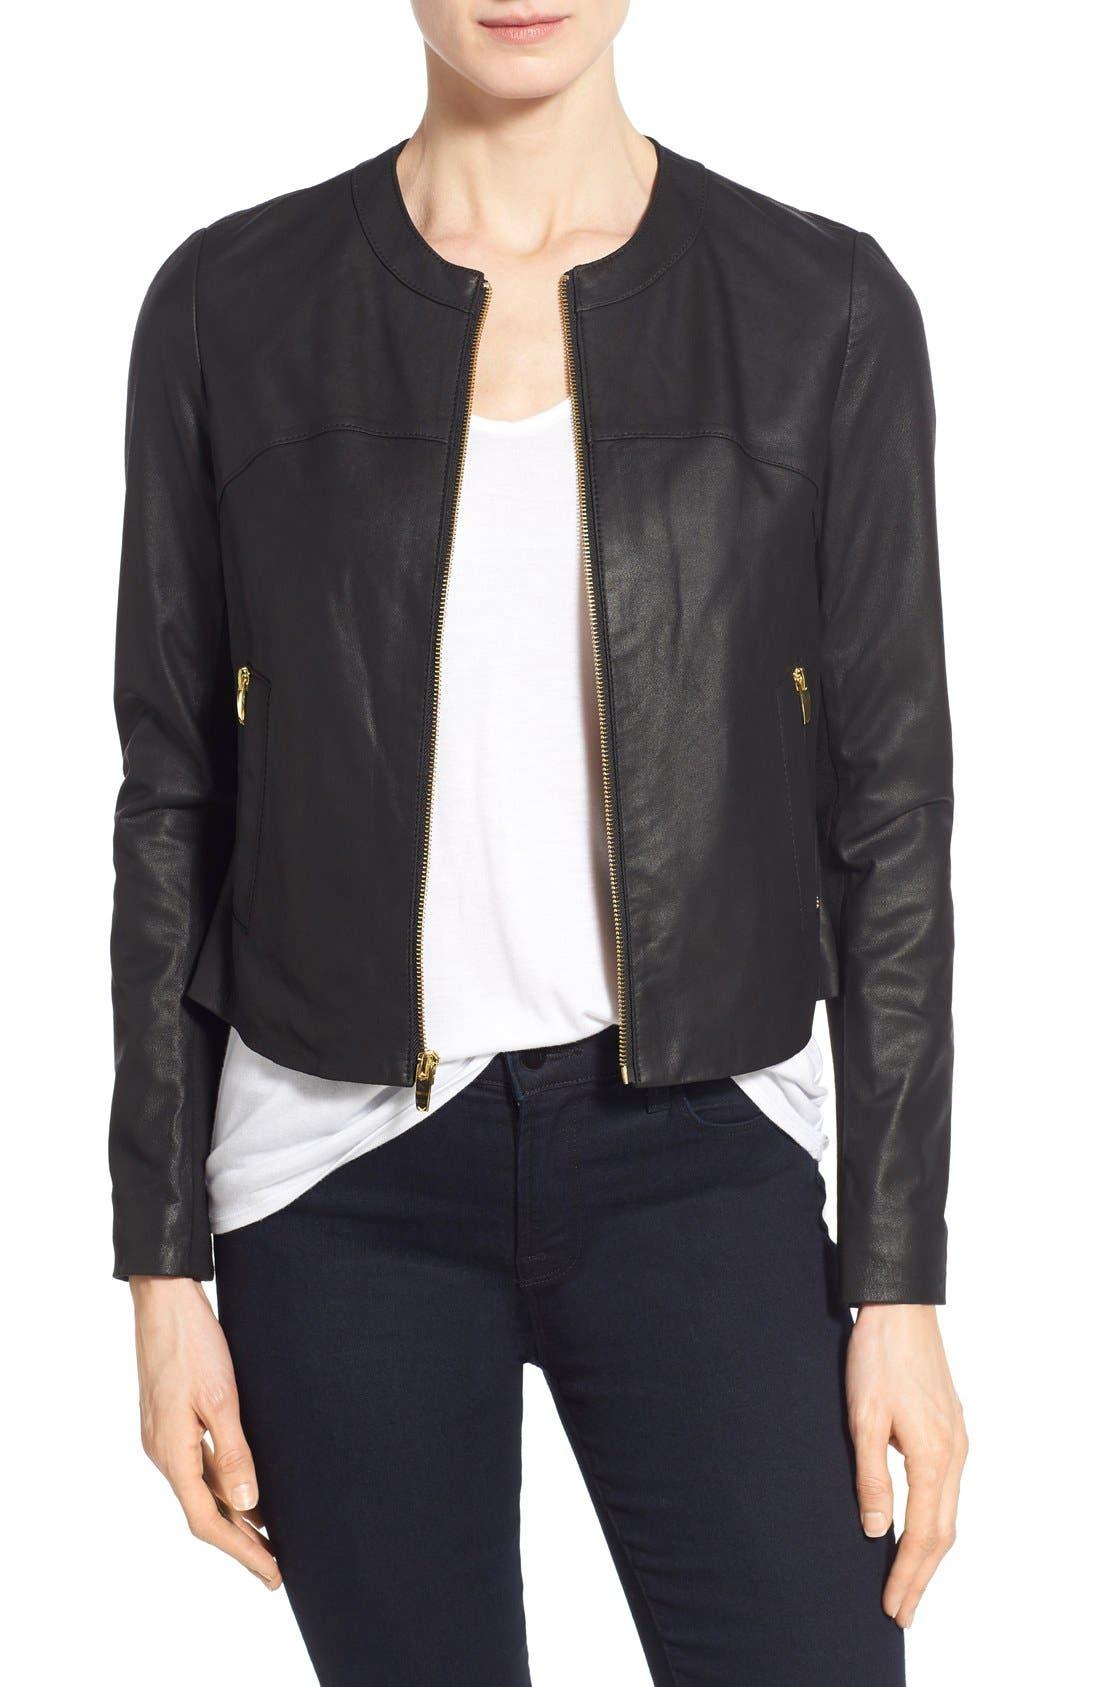 Alternate Image 1 Selected - Via Spiga Lambskin Leather & Knit Zip Front Collarless Jacket